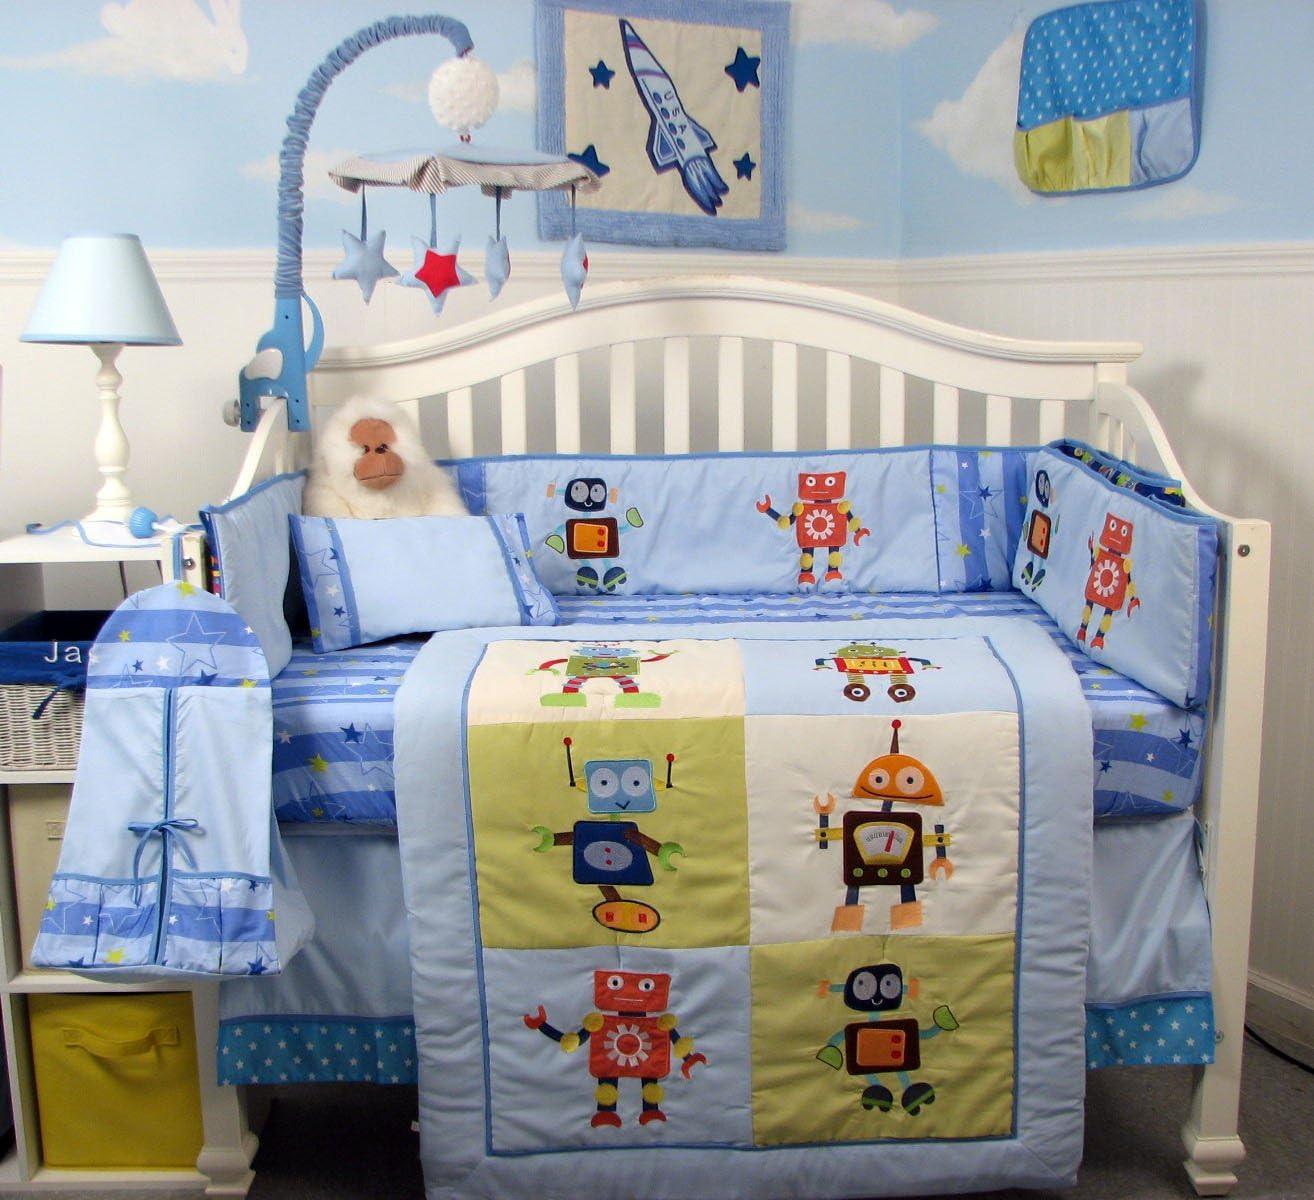 SoHo Mechanical Heros Baby Crib Nursery Bedding Set 14 pcs by SoHo Designs